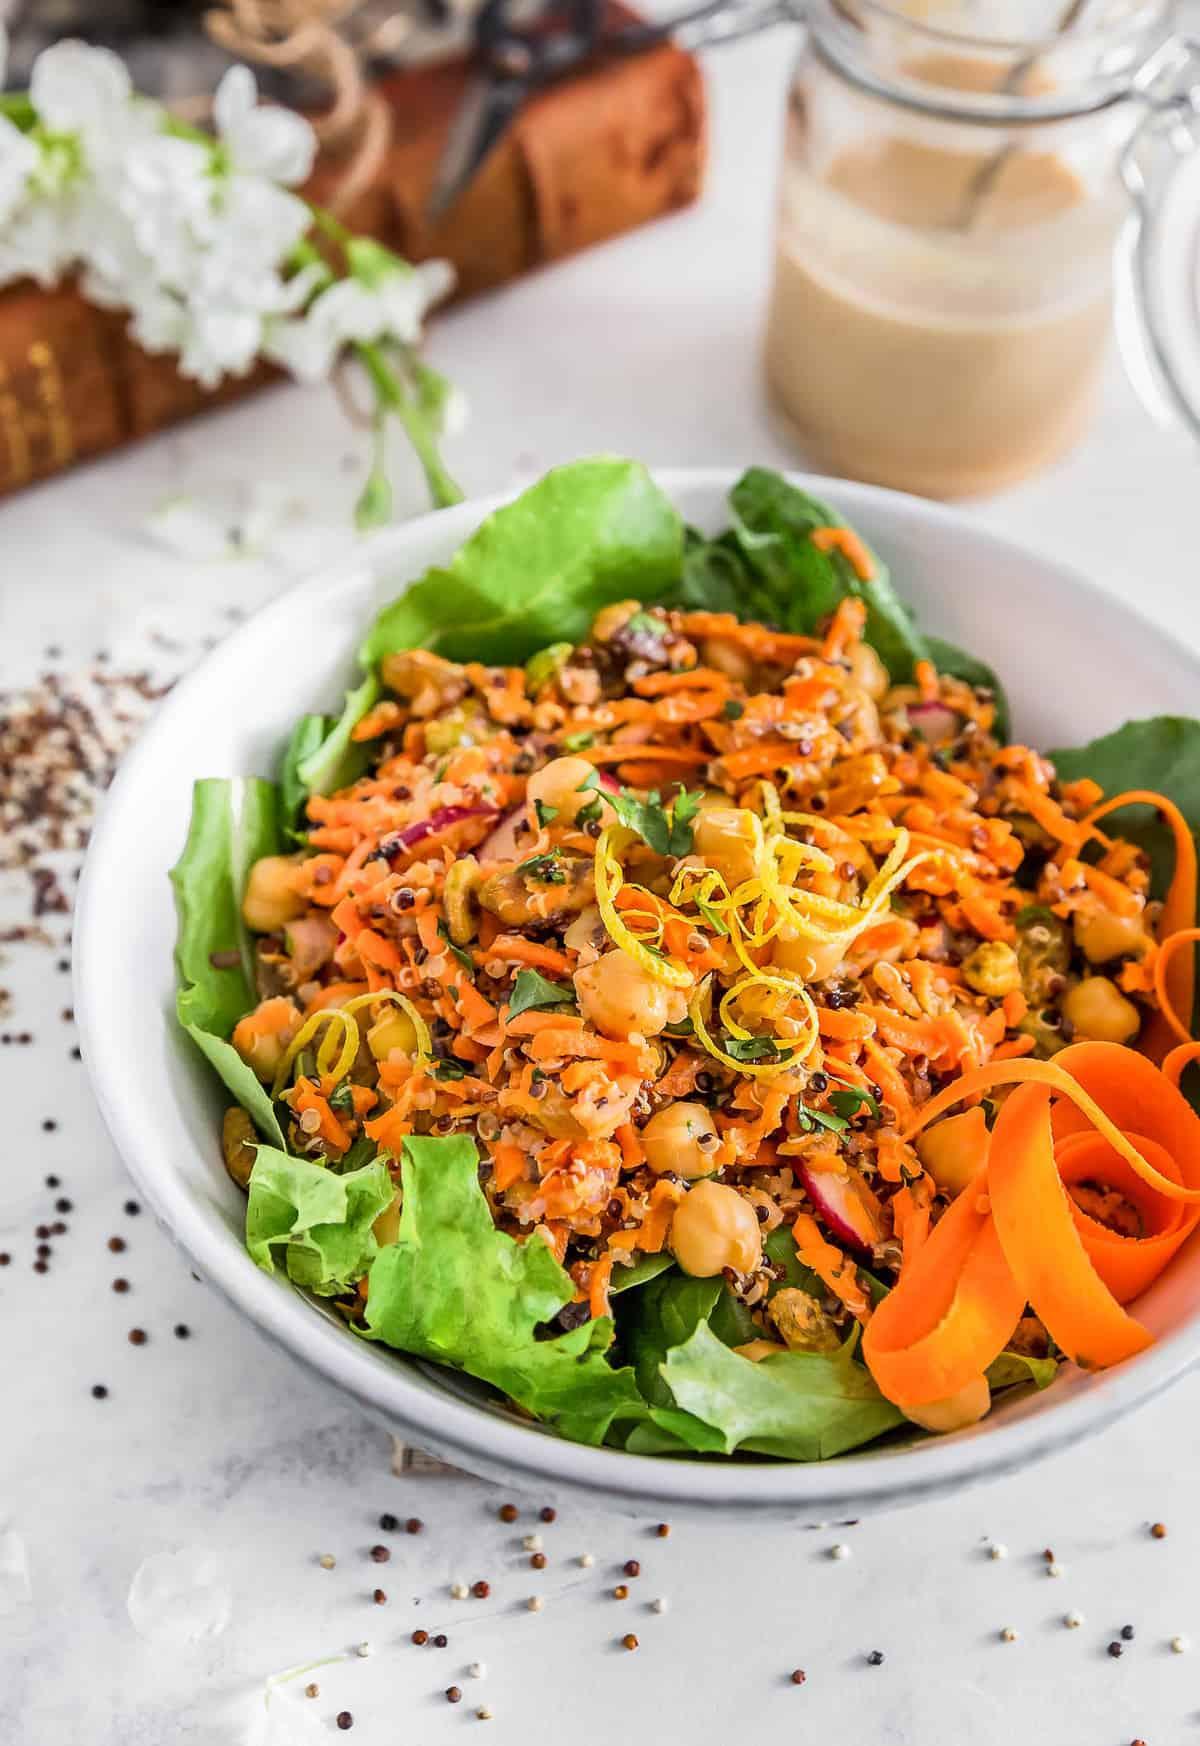 No Oil Moroccan Carrot Quinoa Salad, vegan salad, Moroccan food, carrot, quinoa, salad, plant based, vegan, vegetarian, whole food plant based, gluten free, recipe, wfpb, healthy, healthy vegan, oil free, no refined sugar, no oil, refined sugar free, dairy free, dinner party, entertaining, dinner, lunch, salad, side, carrot salad, Moroccan salad, picnic, easy recipe, appetizer, summer, fall, winter, spring